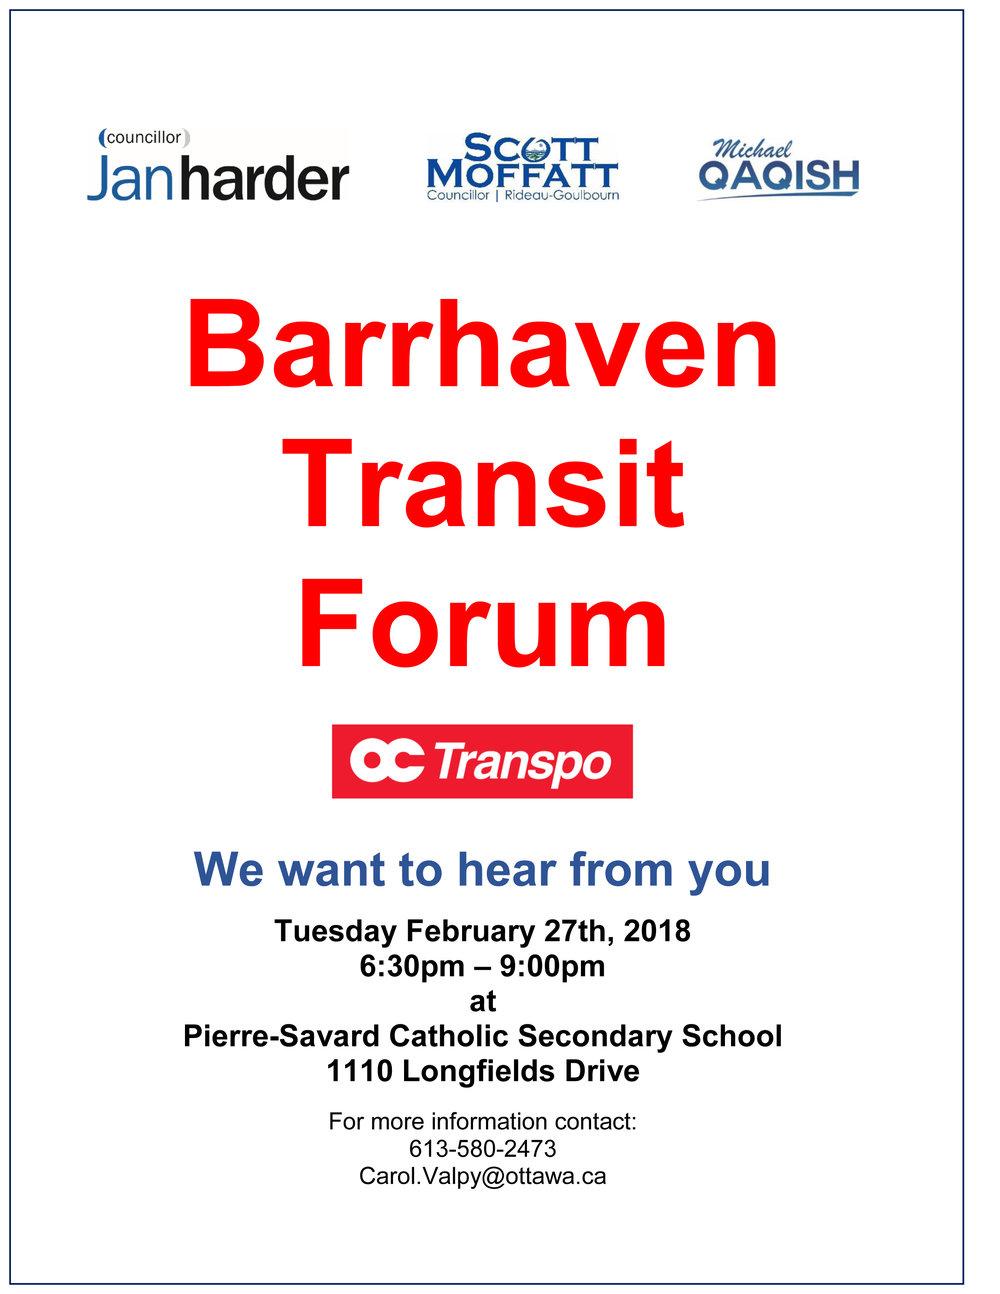 FINAL Barrhaven Transit Forum.jpg